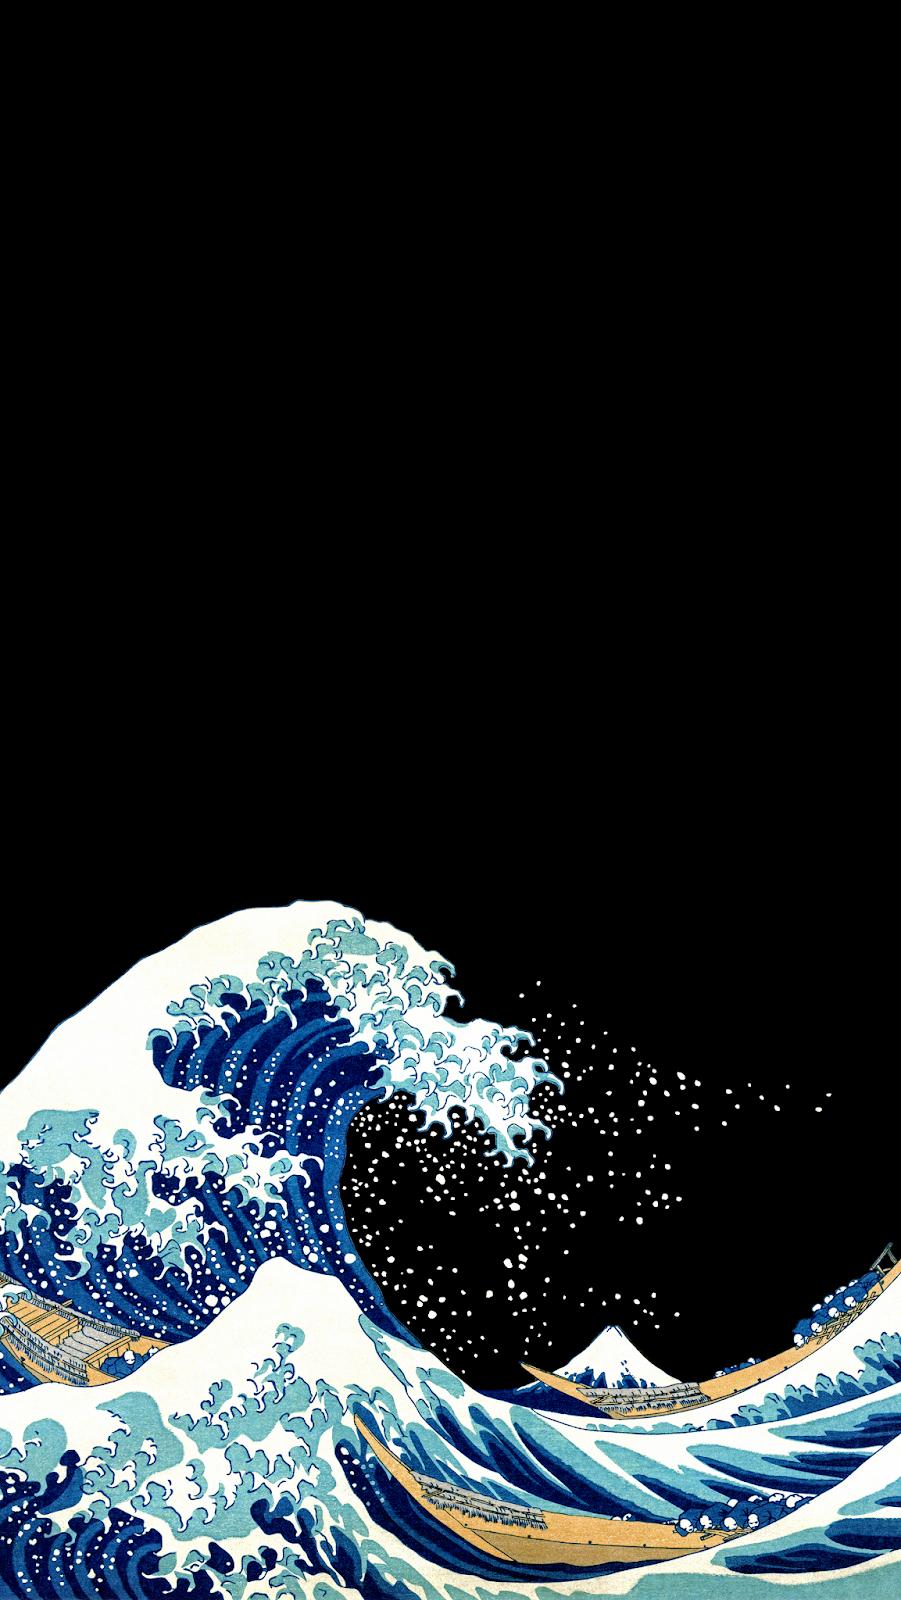 09cdfebc2eb9 AMOLED Great Wave off Kanagawa  wallpaper  iphone  android  background   followme